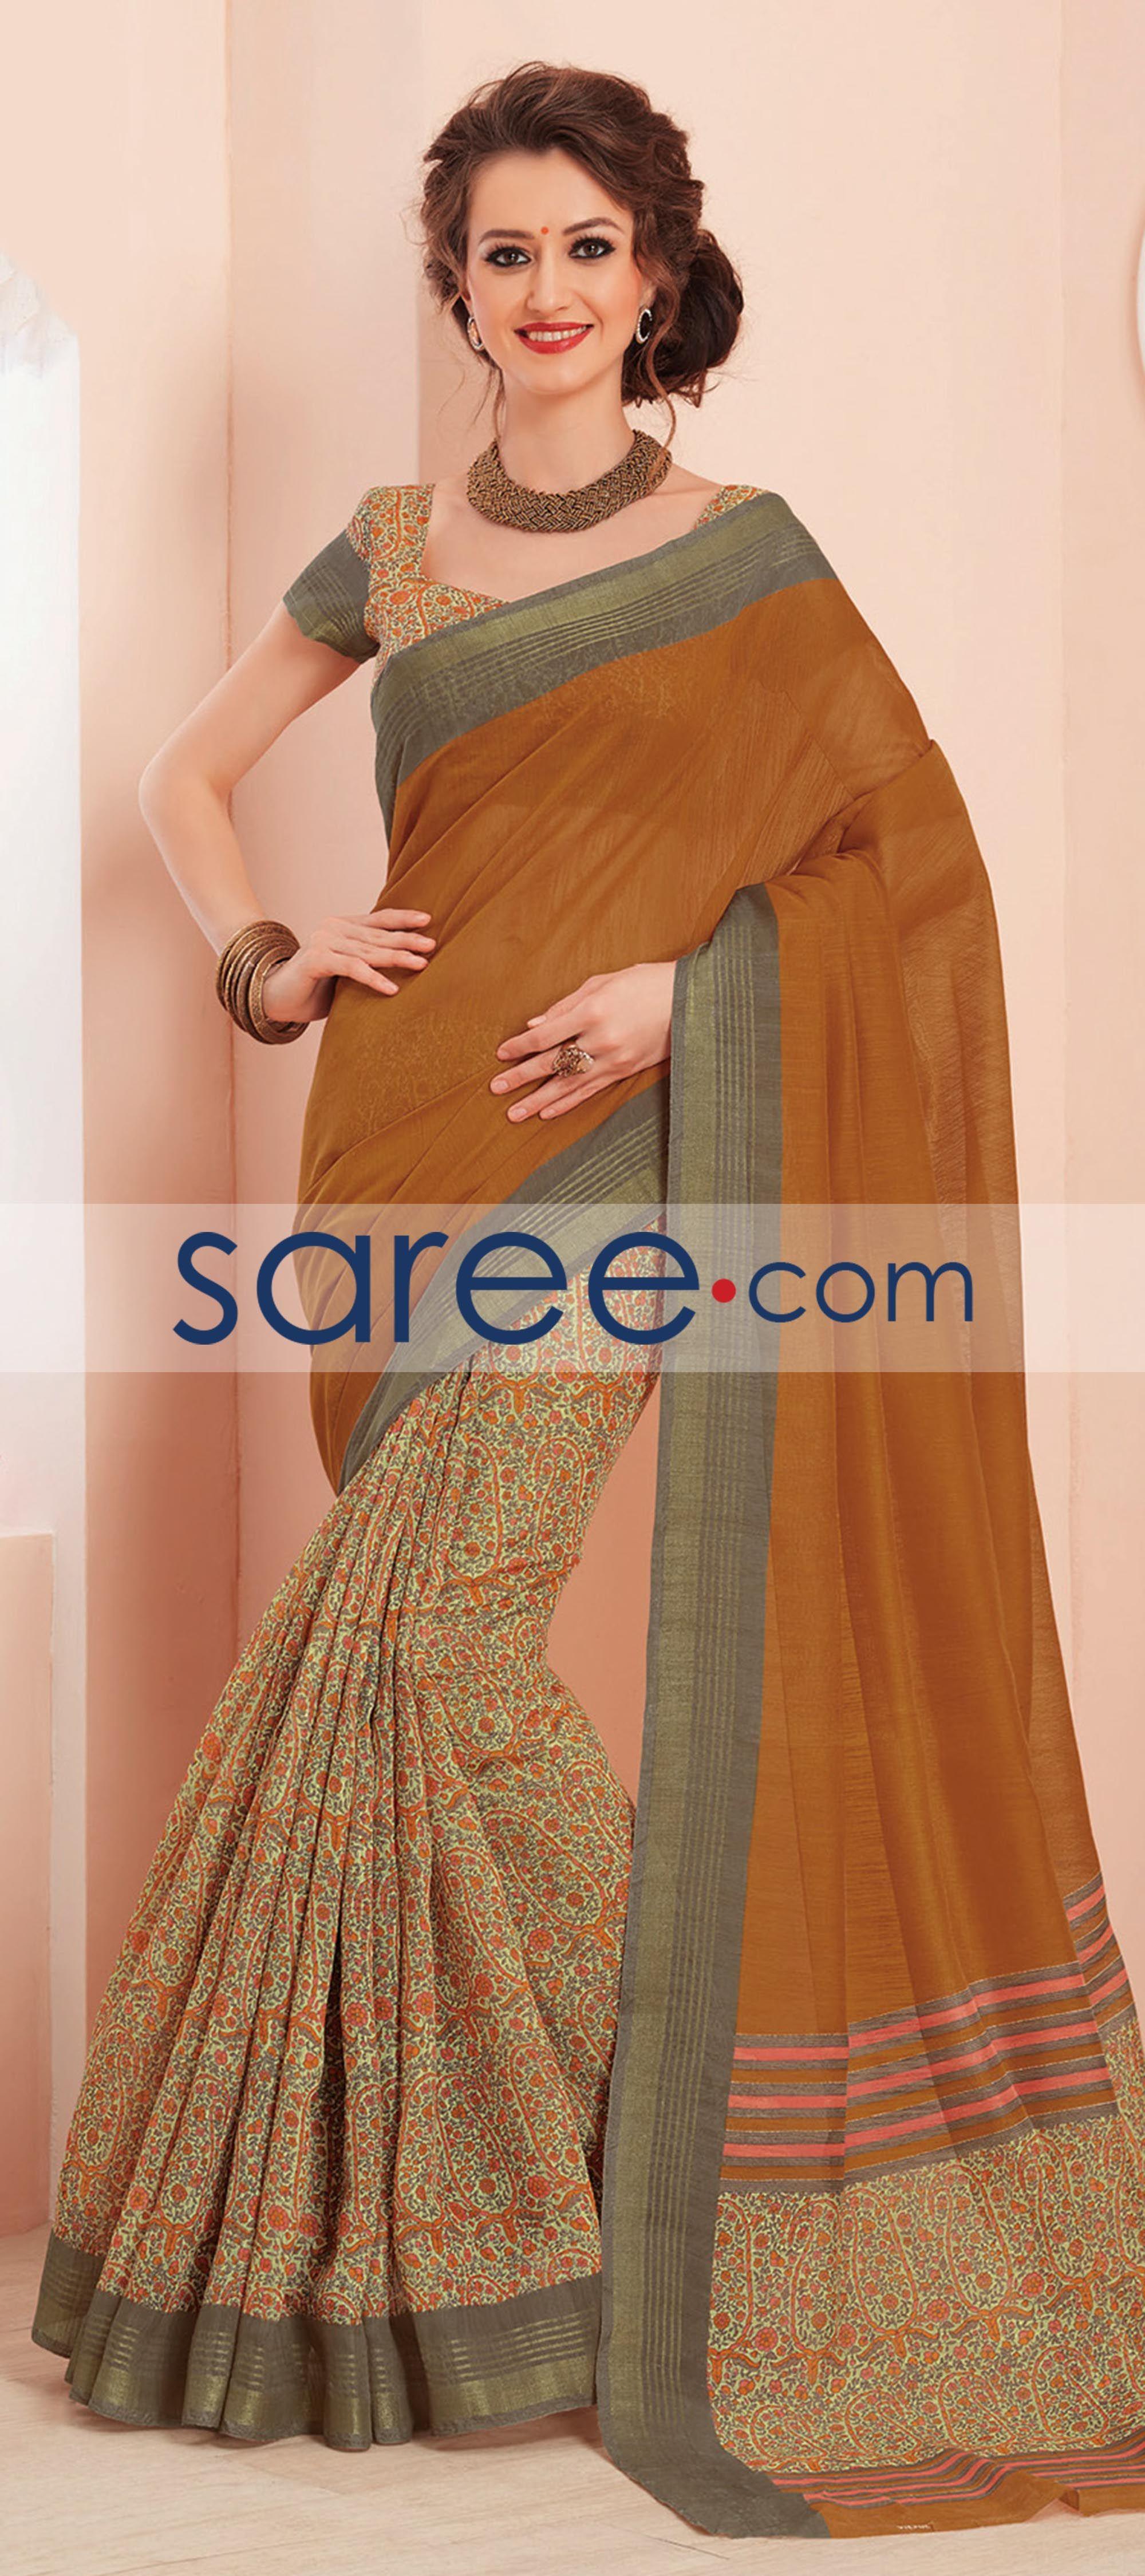 Modern saree models mustard and cream bhagalpuri silk printed saree saree